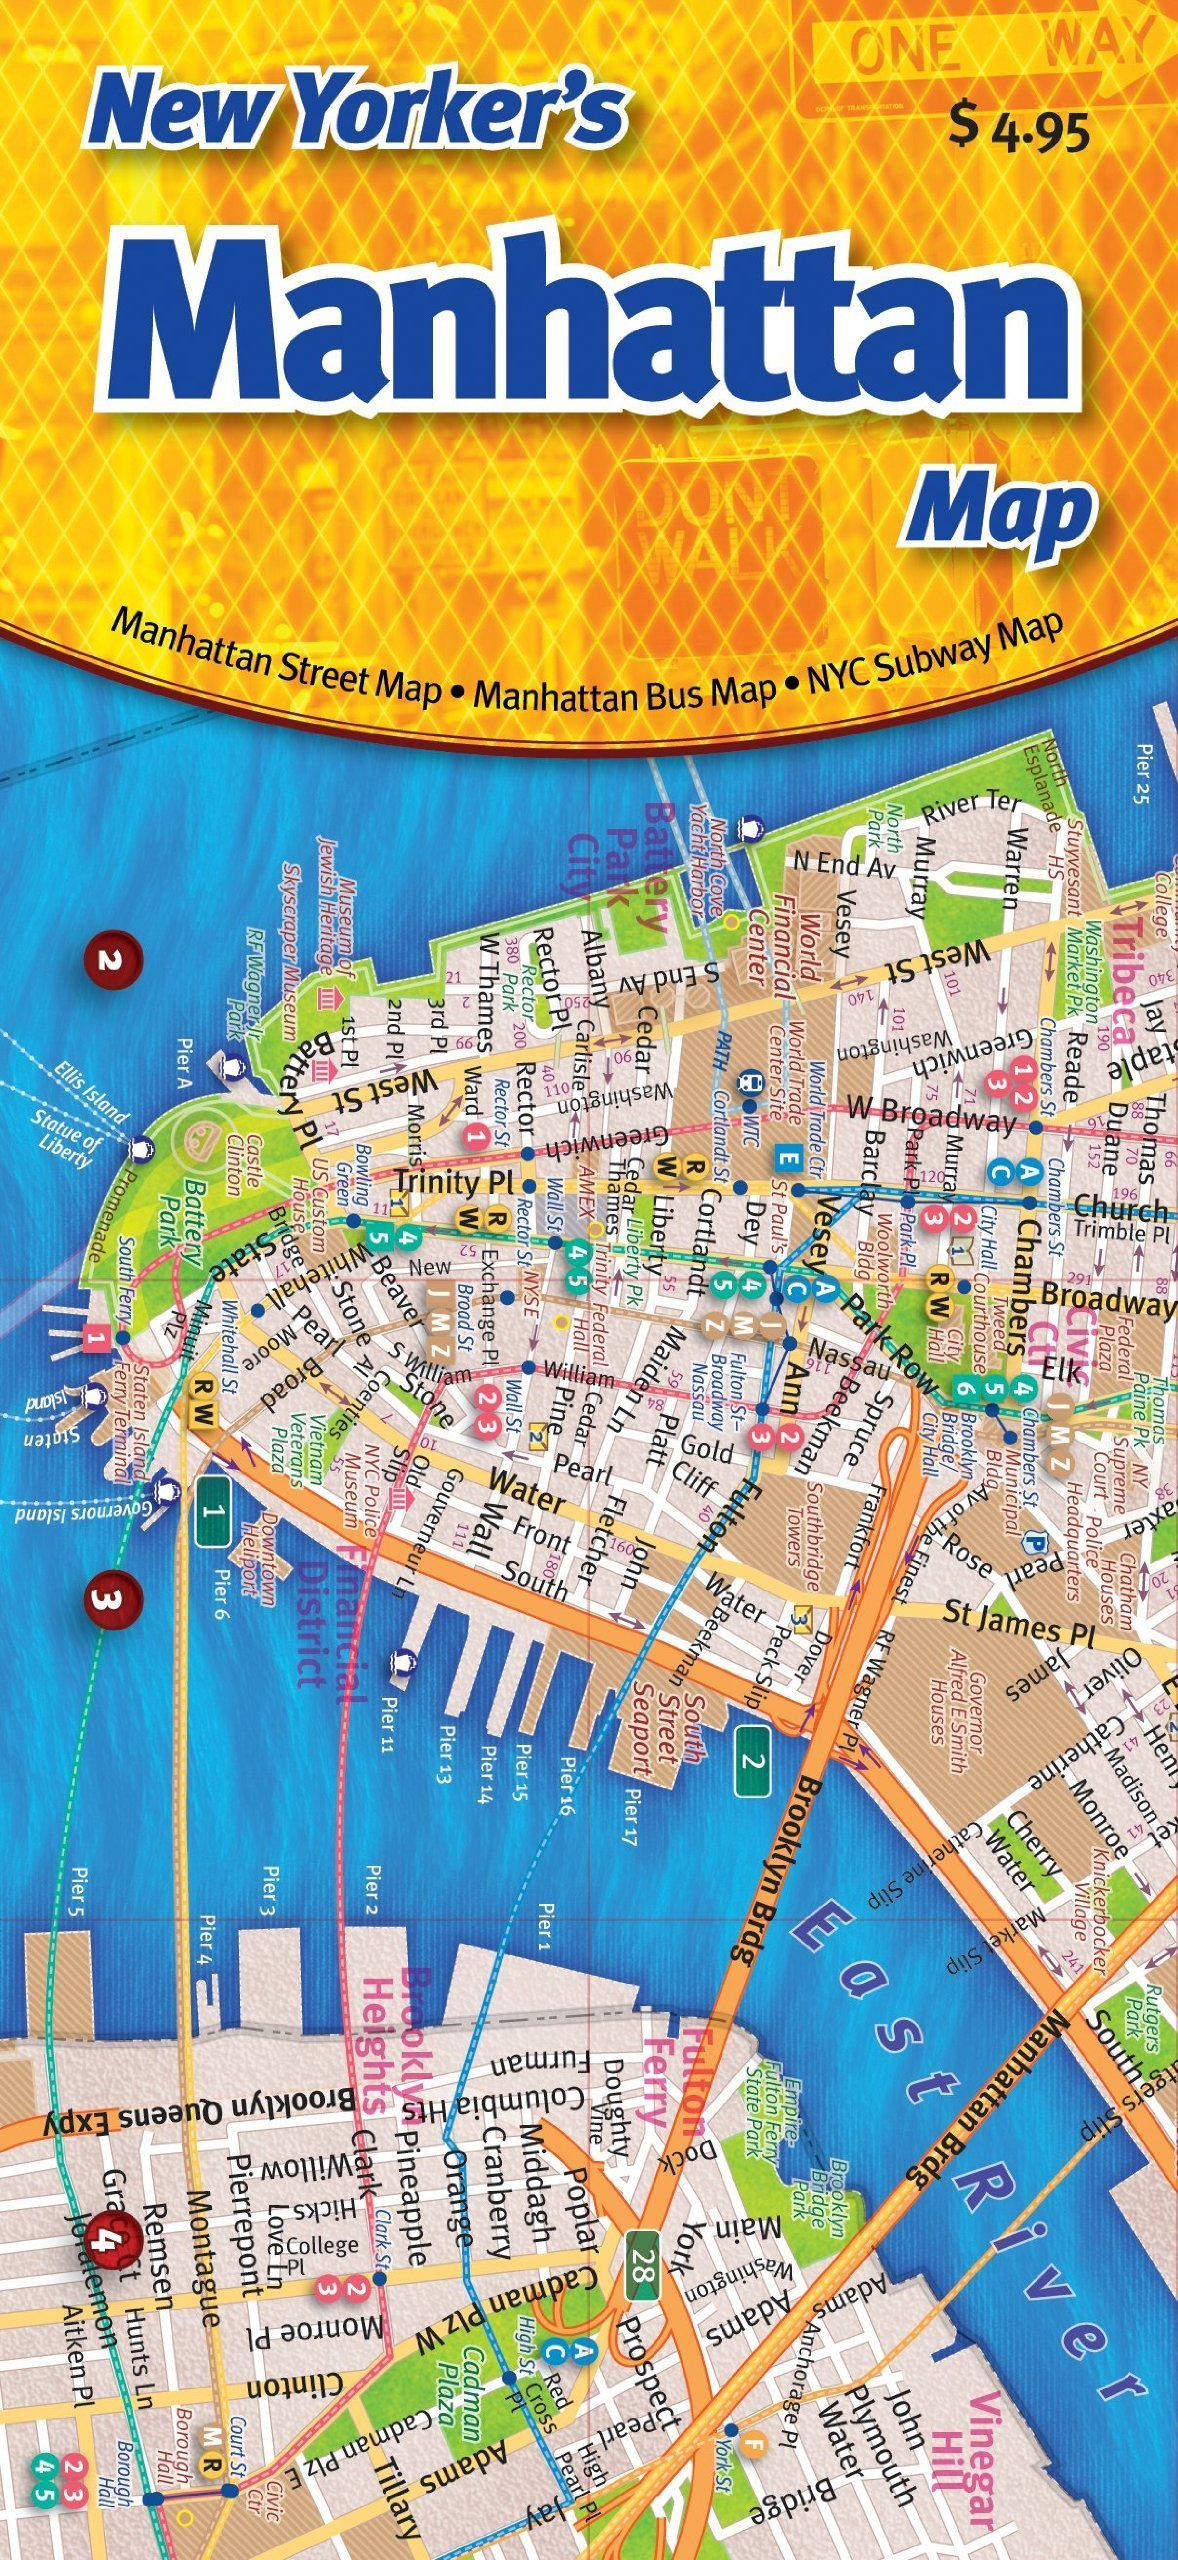 New Yorker's Manhattan Map: Opus Publishing: 9780972966603 ... on map of manhattan, bronx map manhattan, hudson yards new york manhattan, penn station manhattan, midtown manhattan, metro subway map manhattan, harlem map manhattan, new york uptown manhattan, long island map manhattan, street map manhattan, nyc mta subway map manhattan, new york weather manhattan, new york manhattan skyline, new york subway routes, united states map manhattan, new york hotels manhattan, new york subway lines manhattan, brooklyn bridge manhattan, 1940's new york city manhattan, new york lower east side manhattan,